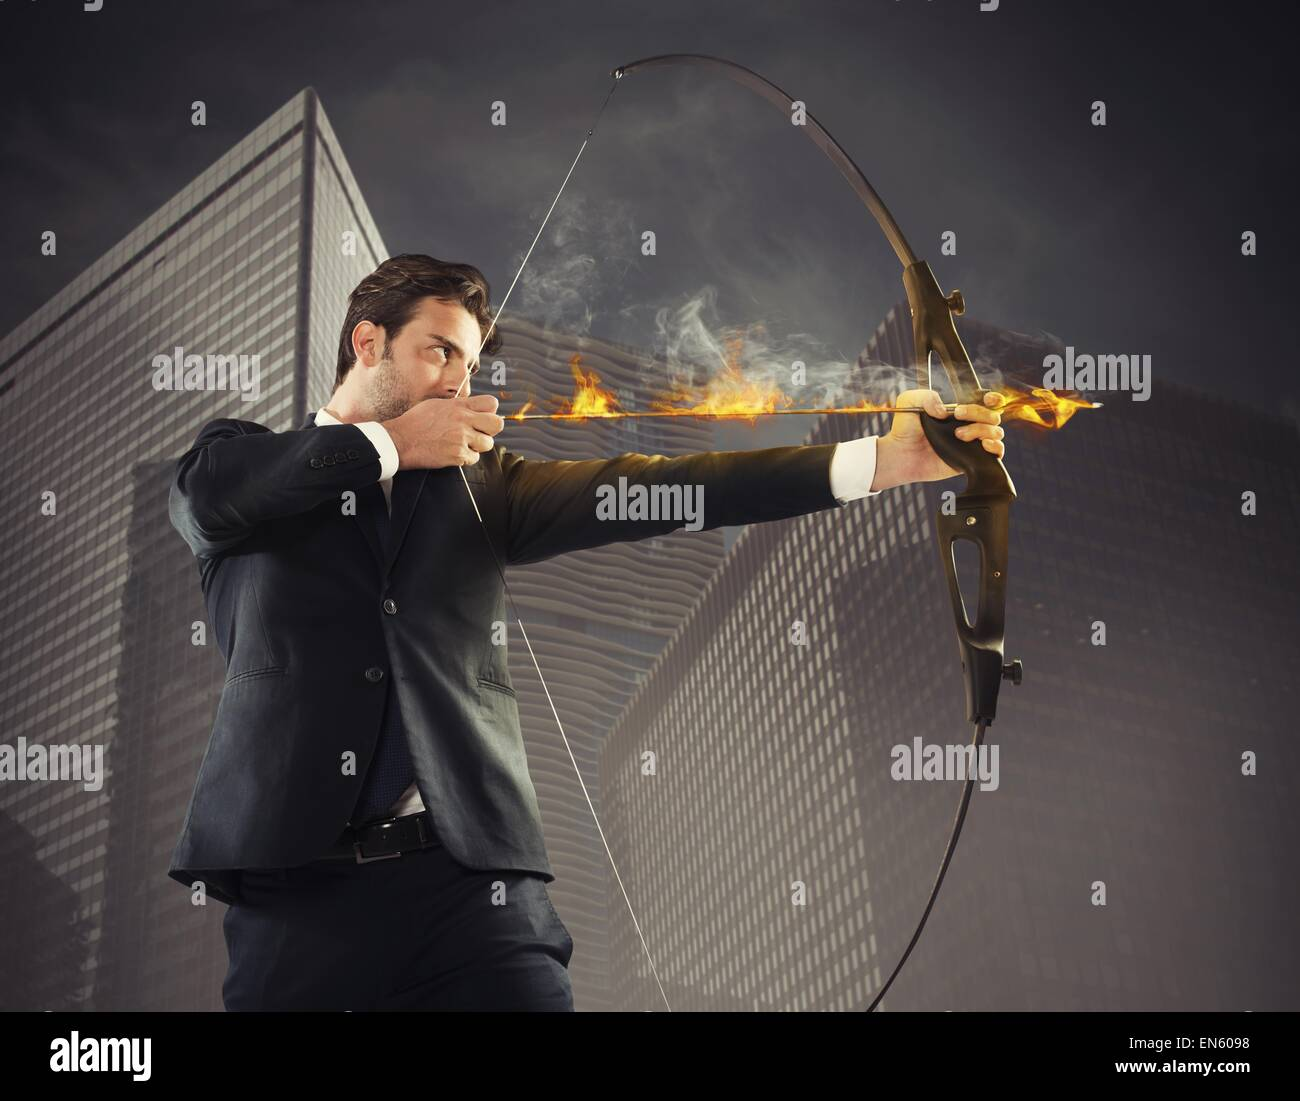 Businessman takes aim - Stock Image